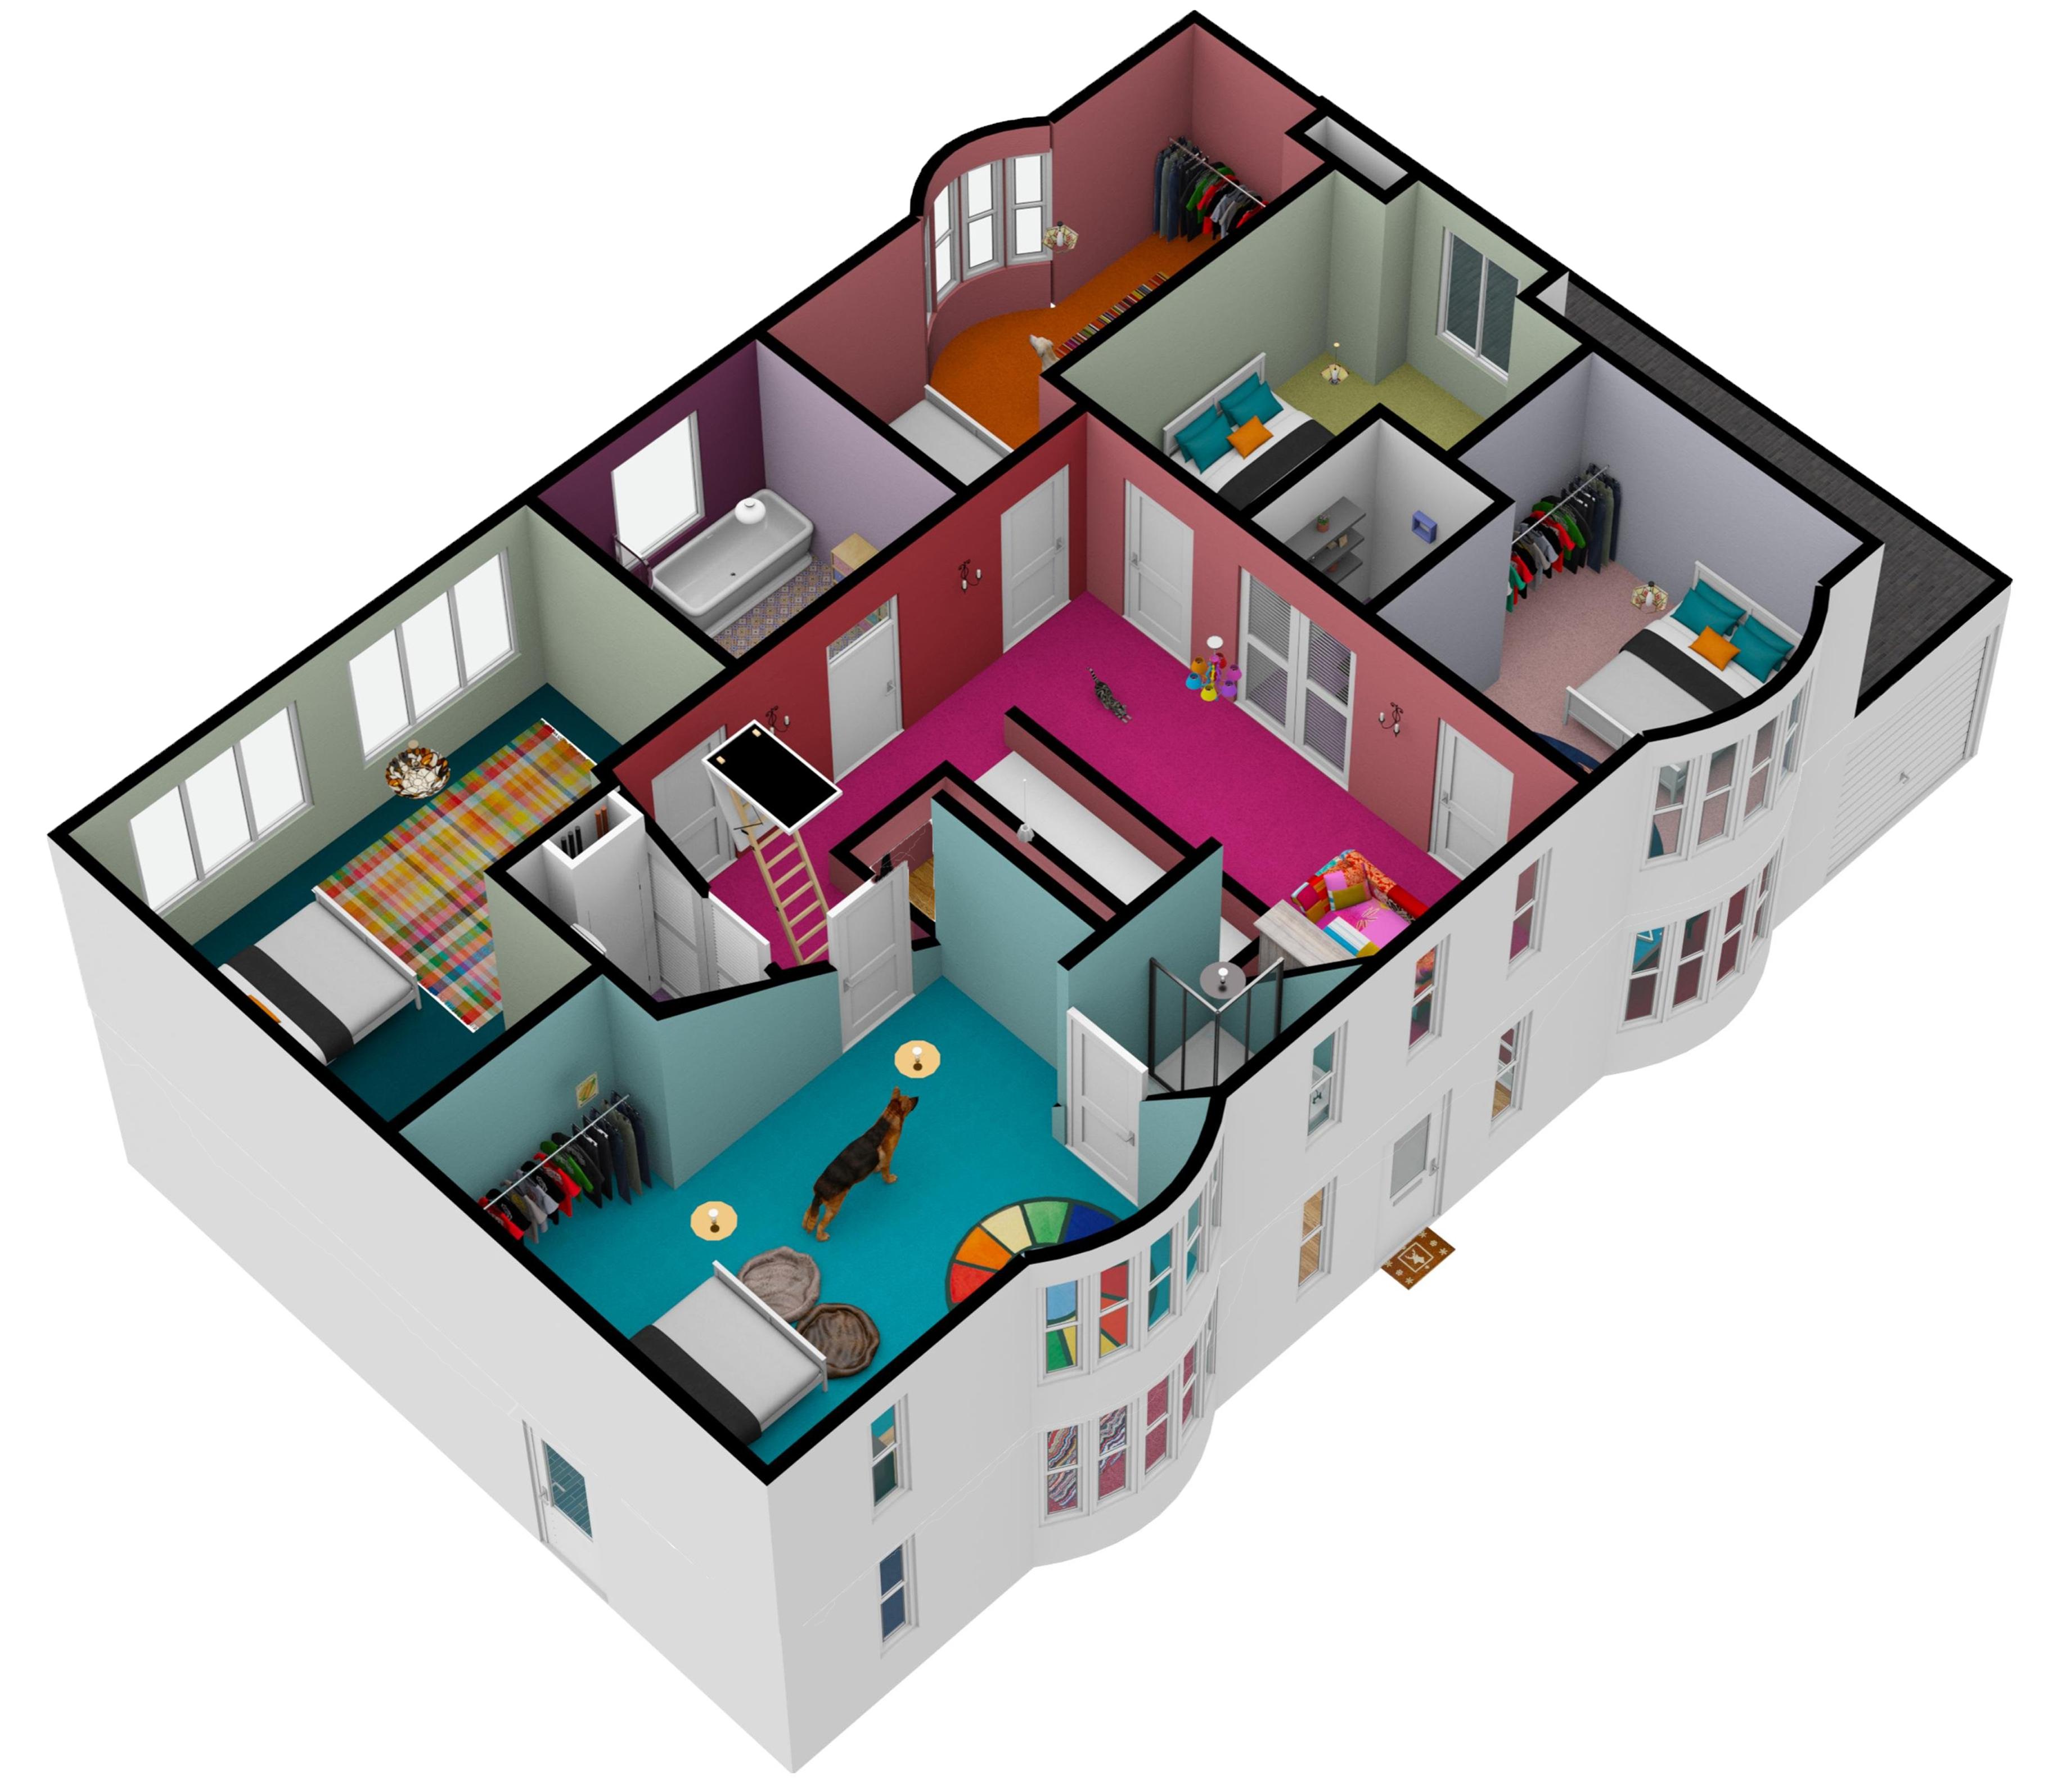 House floors merged